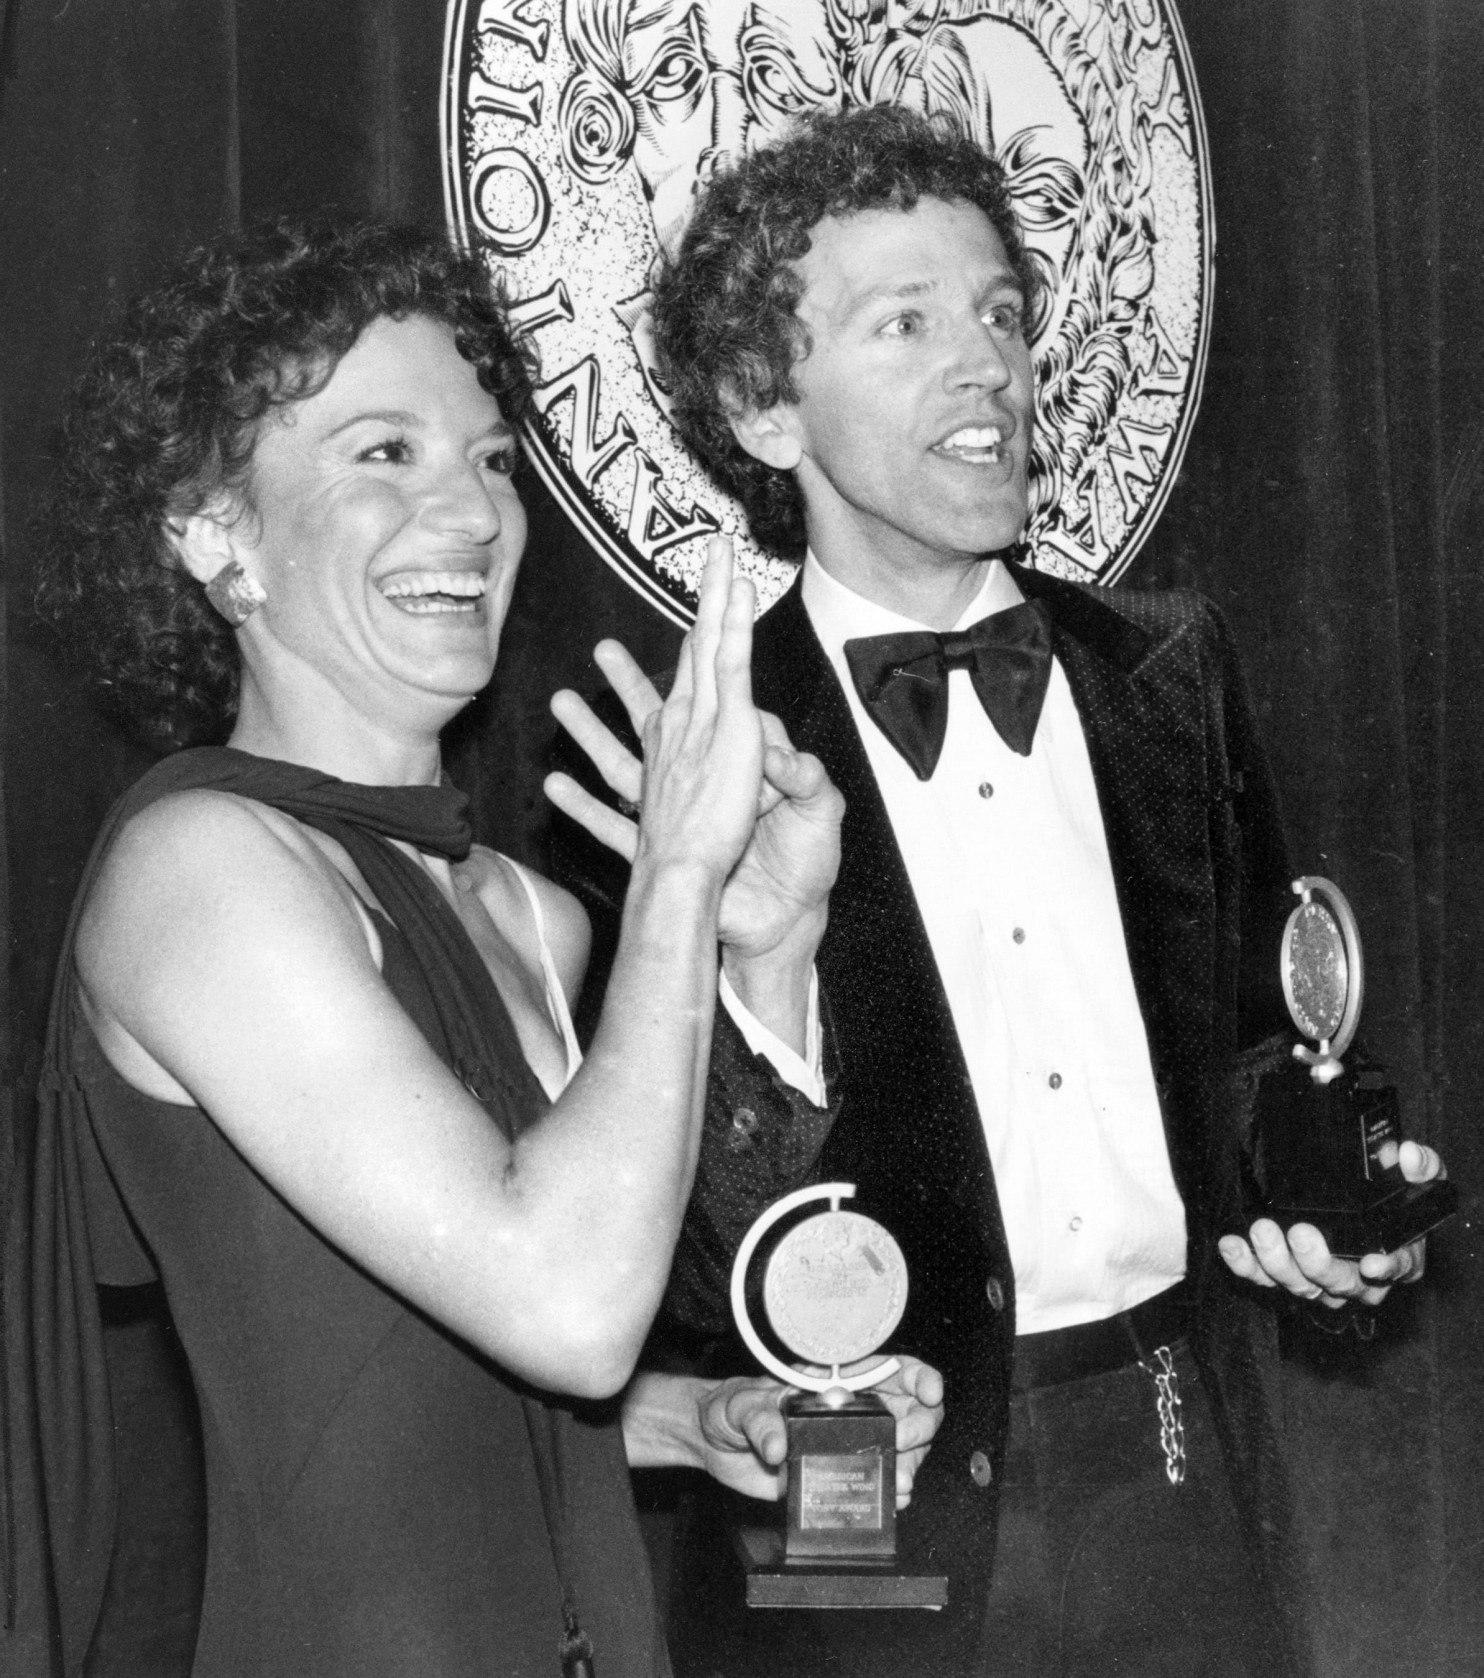 Phyllis Frelich and John Rubenstein celebrate the Tony Award for Children of a Lesser God